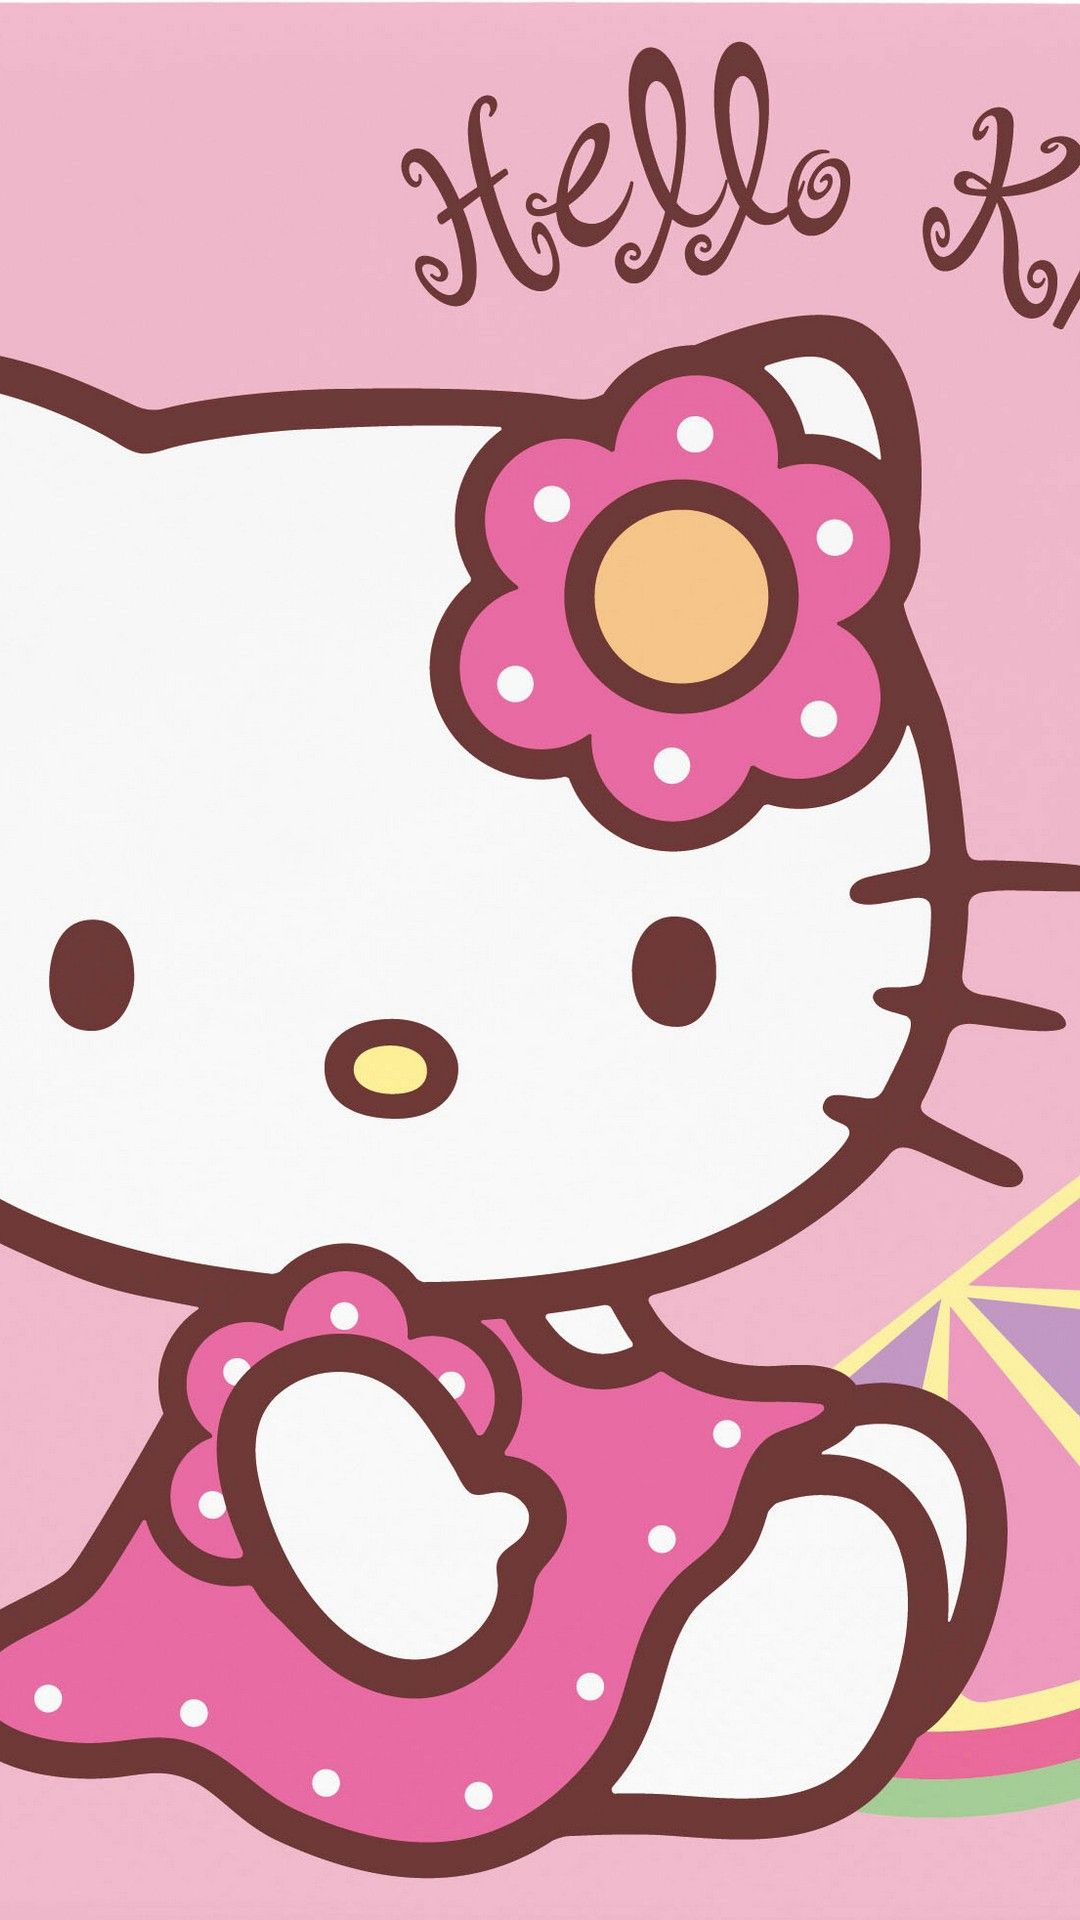 Hello Kitty Wallpaper Hd Hello Kitty Wallpaper Hd